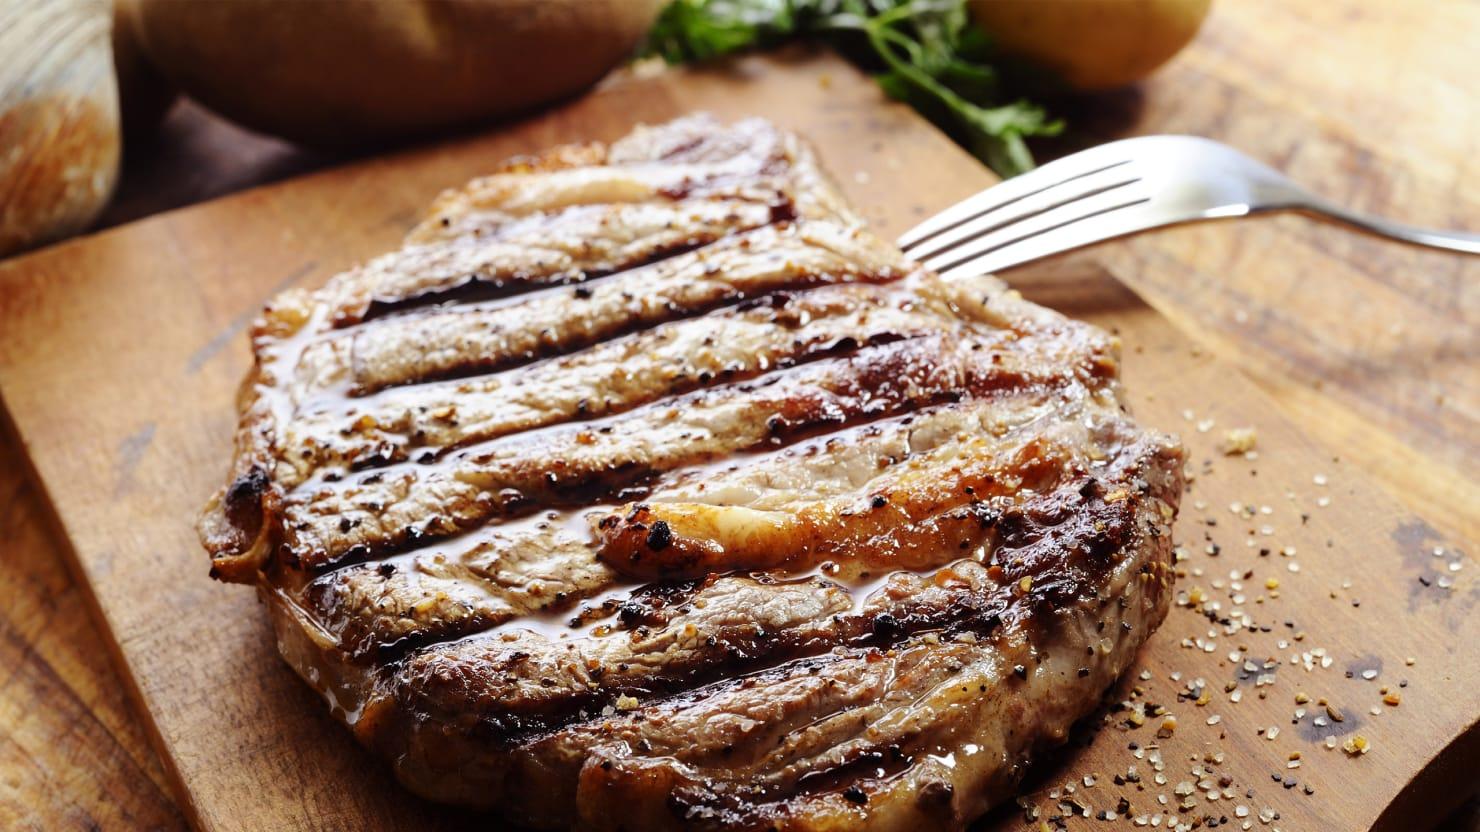 Bj steak day